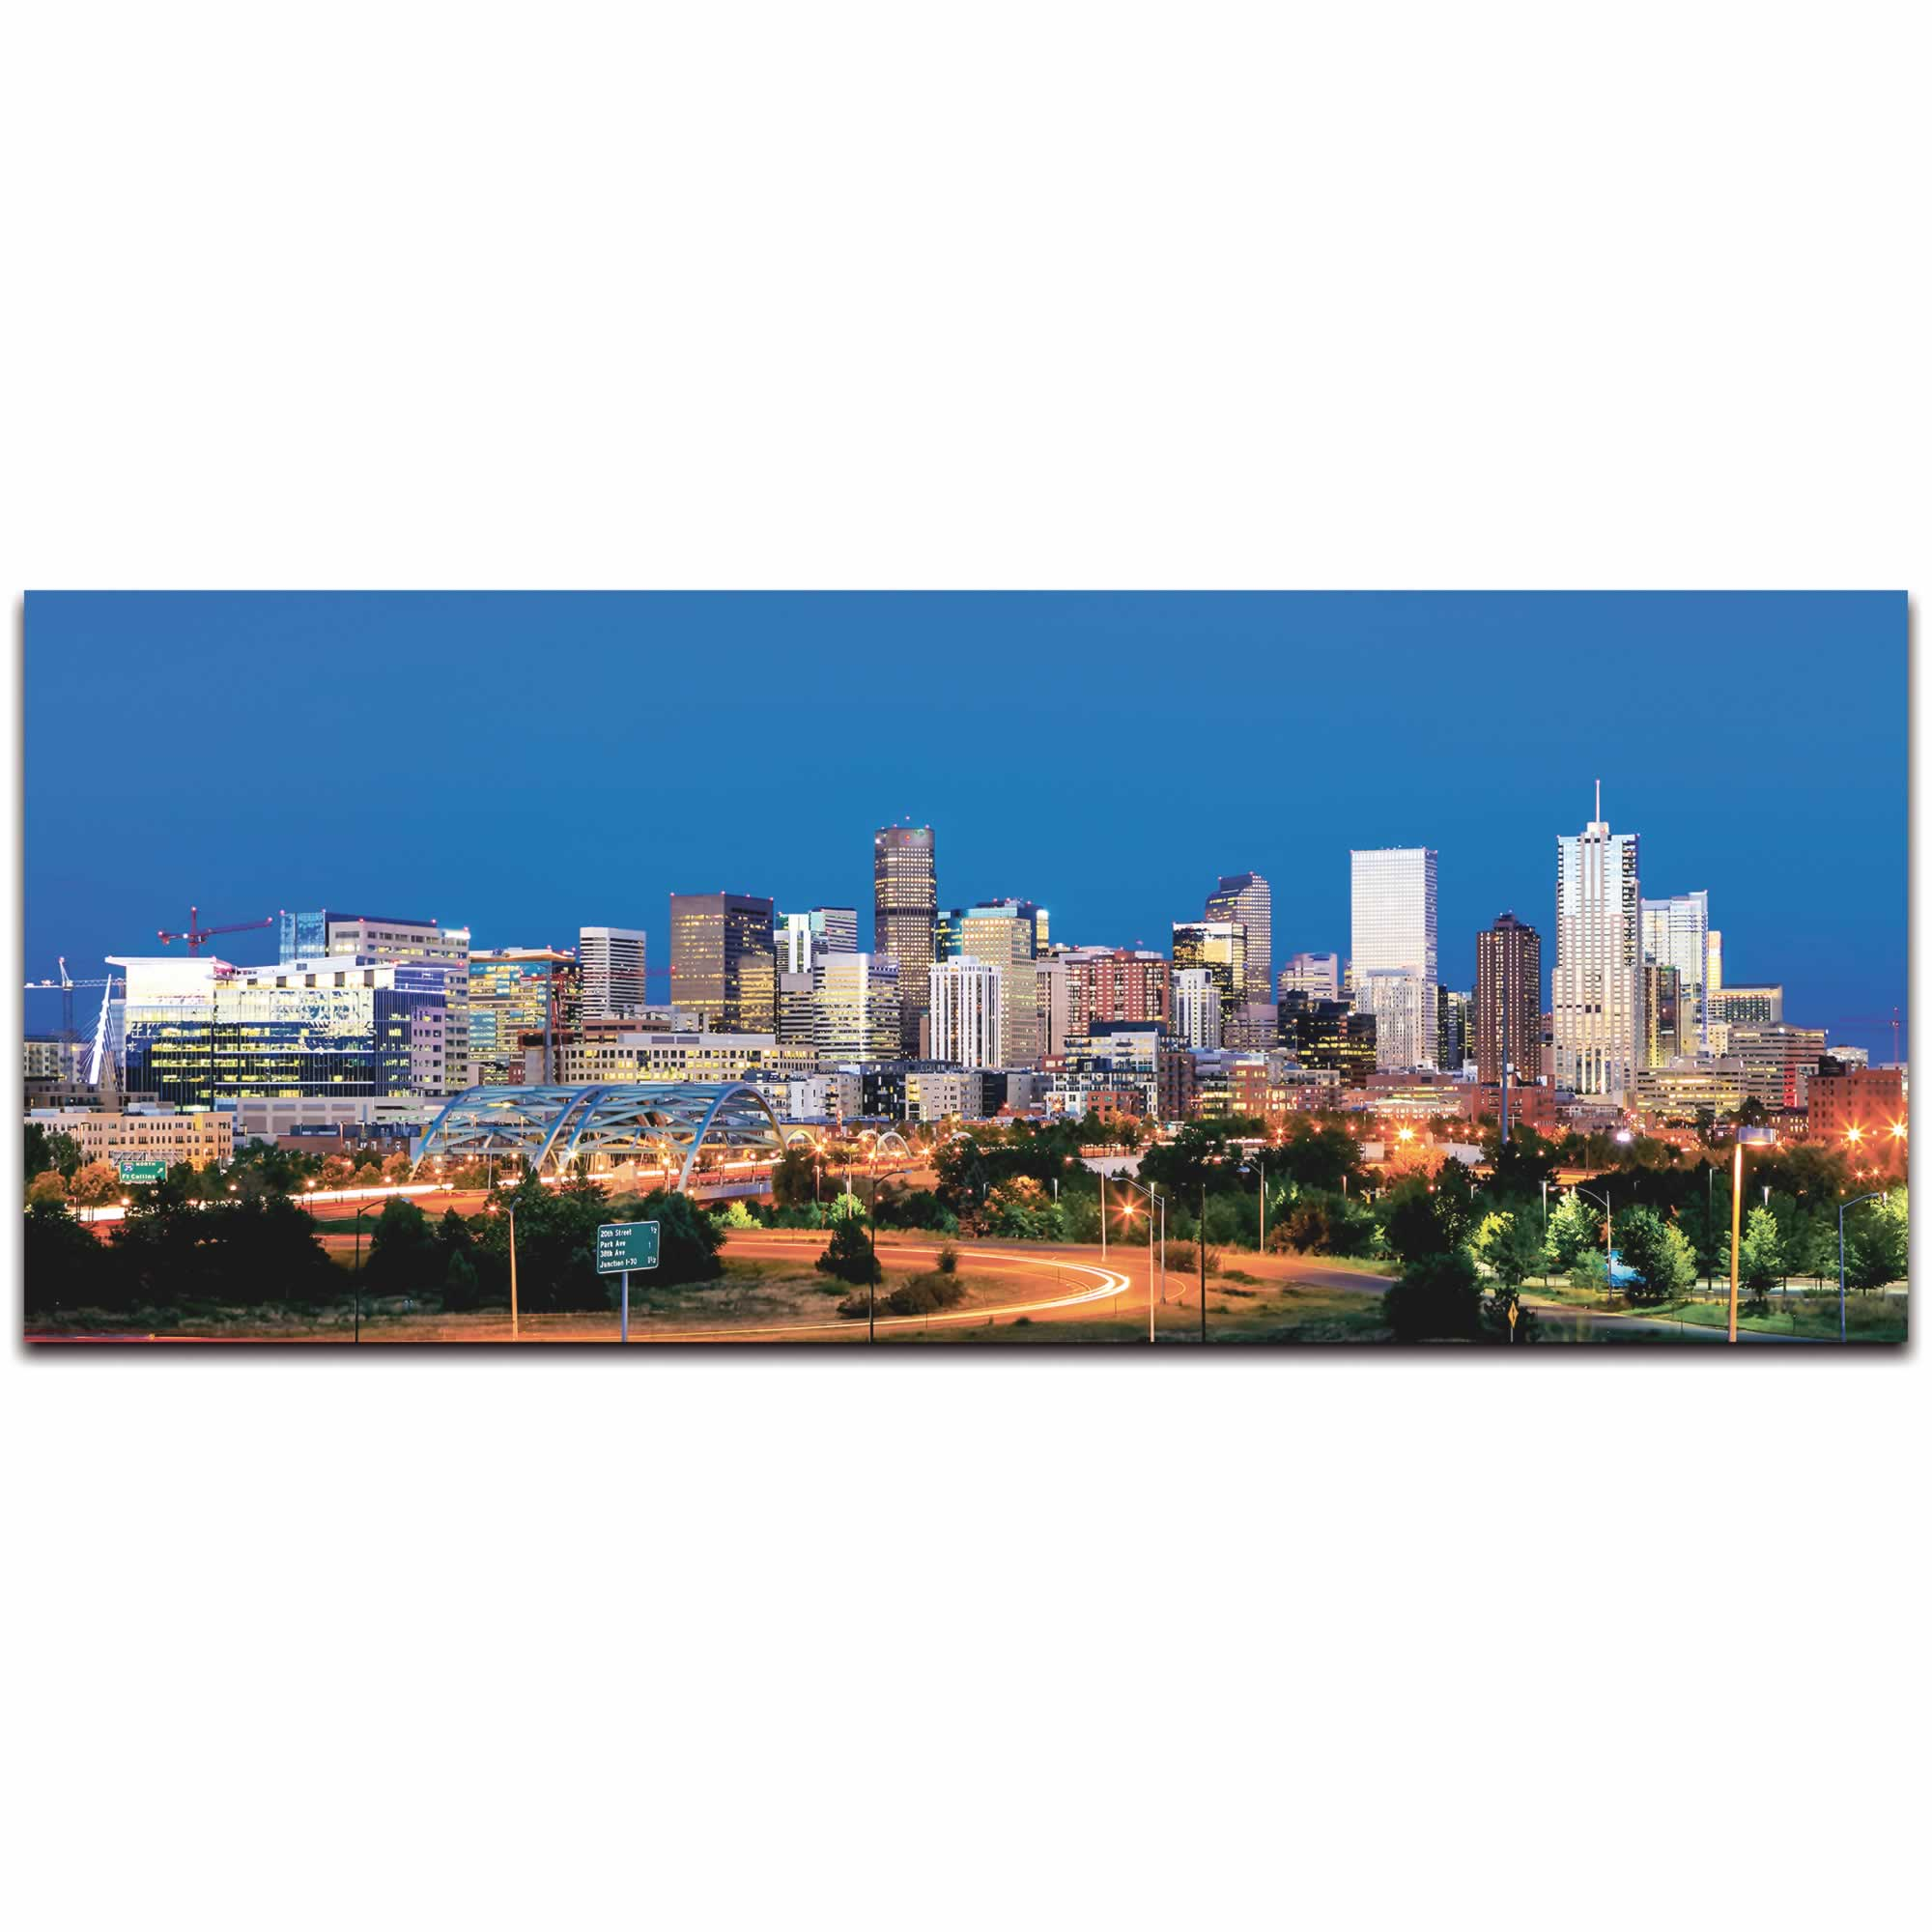 Denver City Skyline - Urban Modern Art, Designer Home Decor, Cityscape Wall Artwork, Trendy Contemporary Art - Alternate View 2